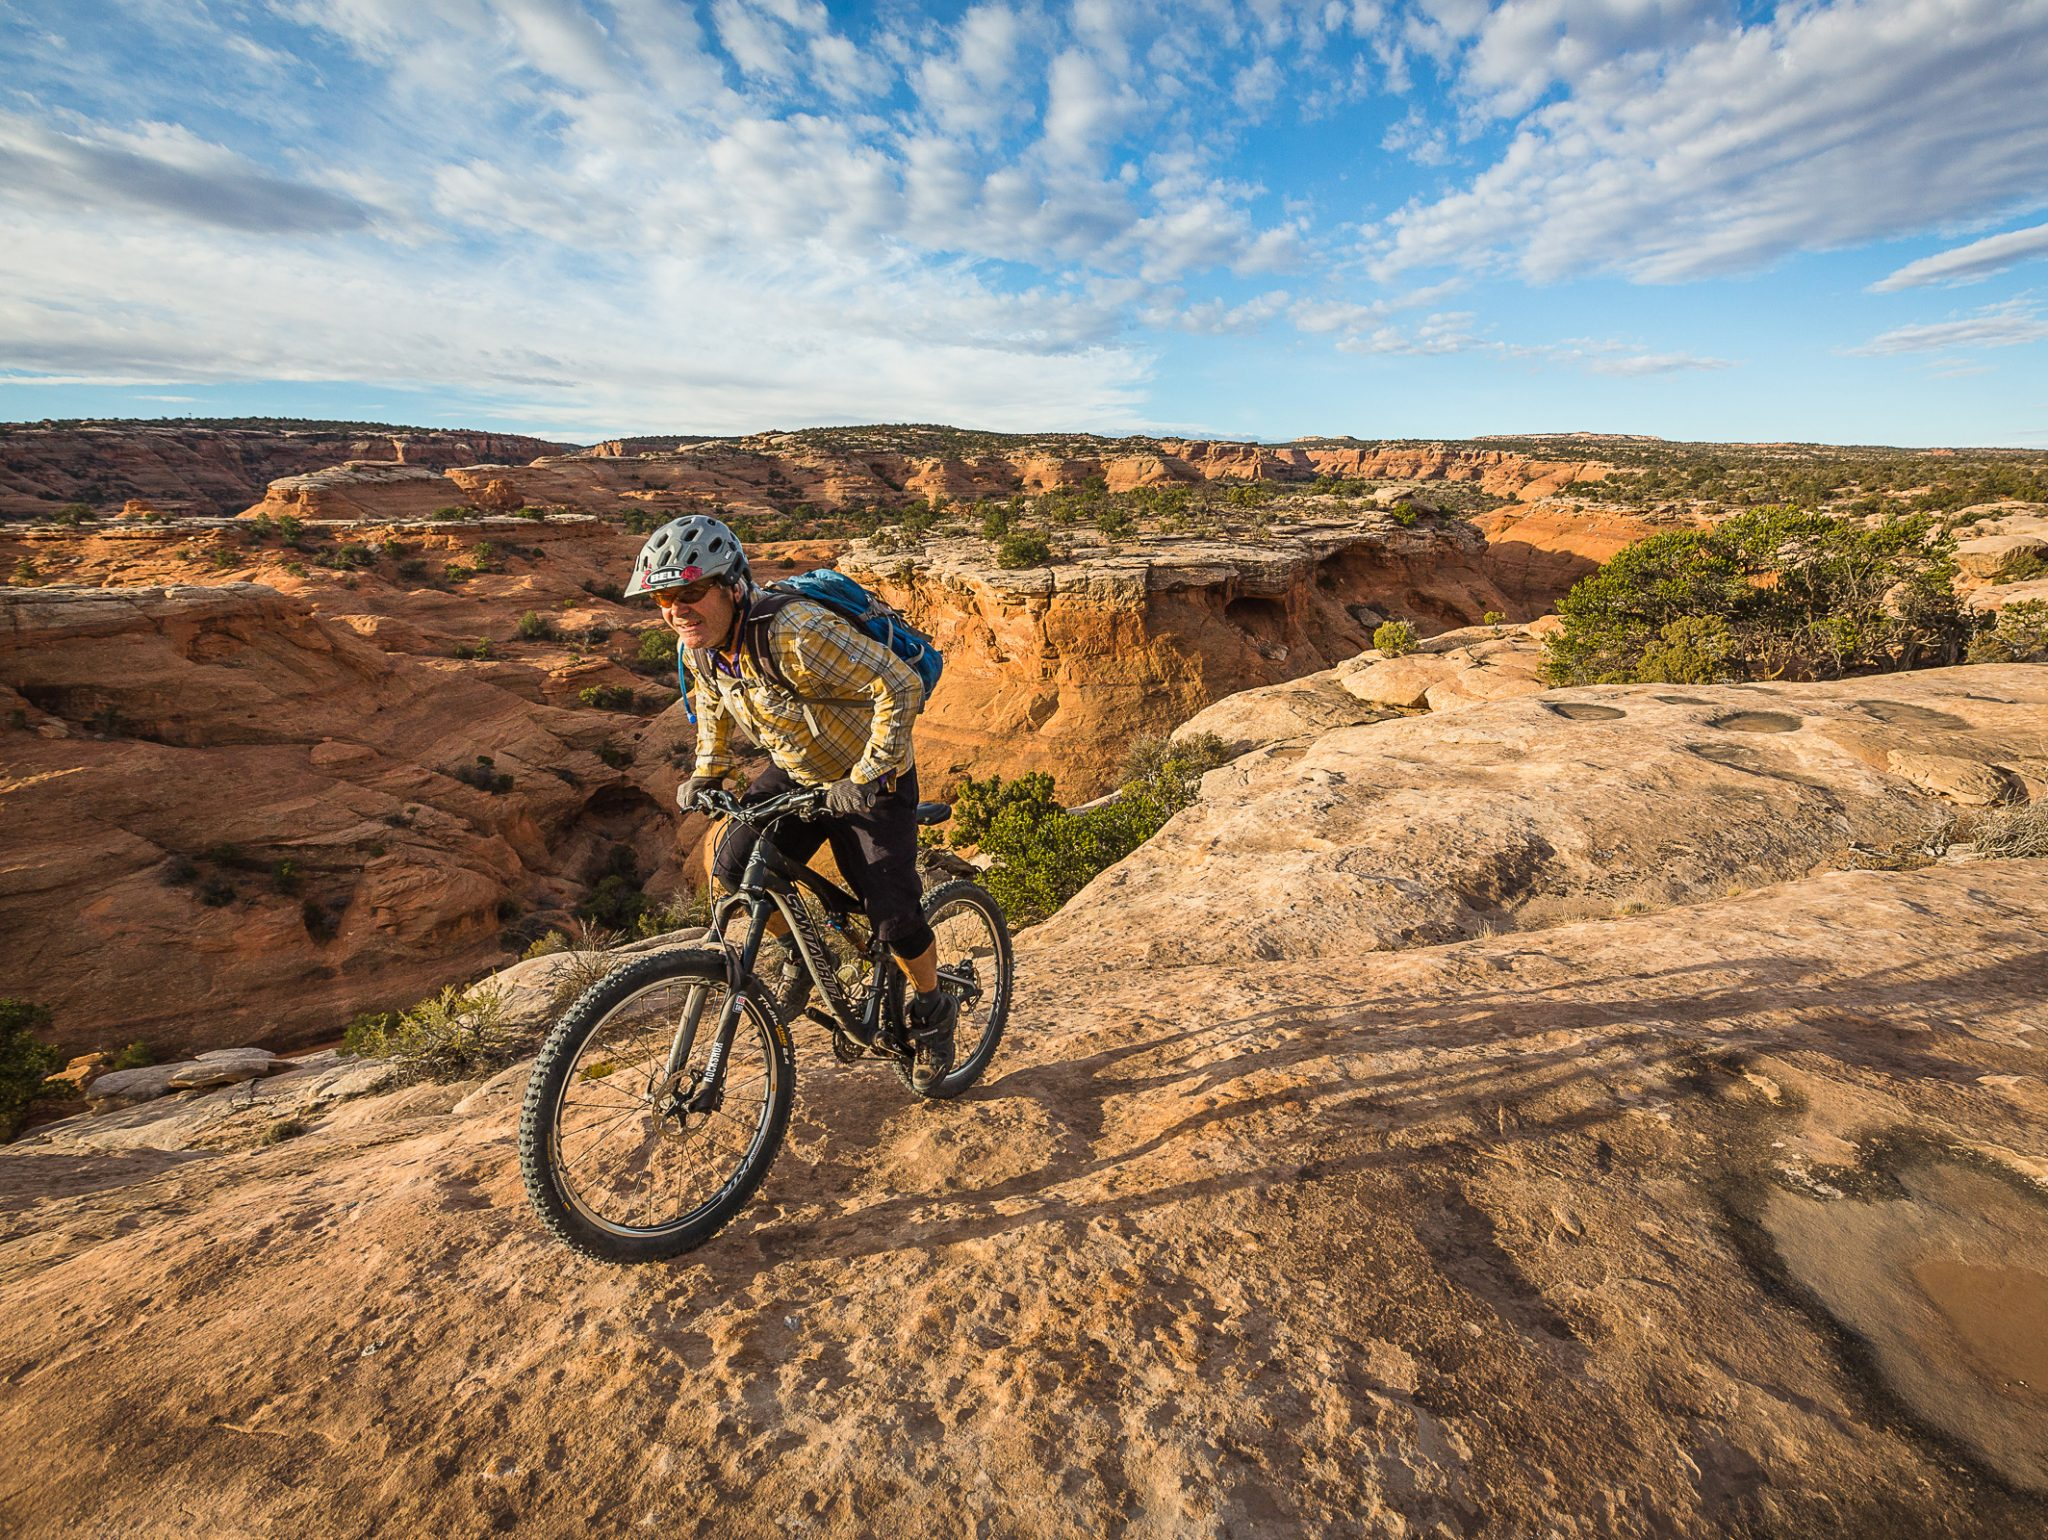 Mountain biking on the Mag 7 trail system near Moab, Utah.